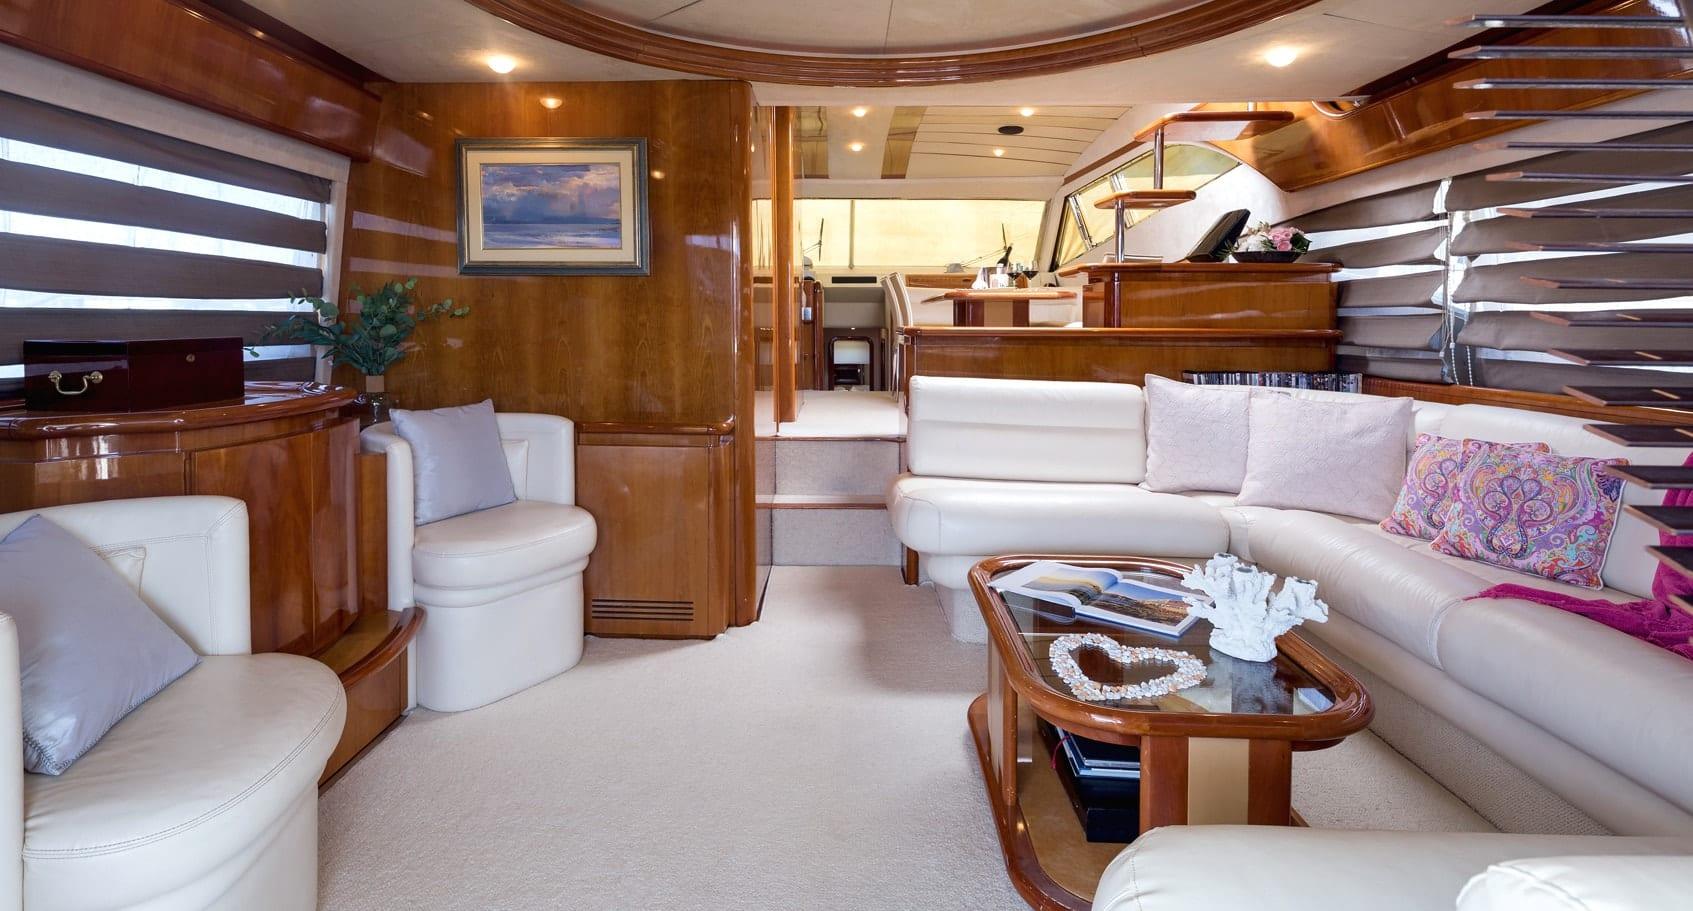 meli motor yacht salon main min -  Valef Yachts Chartering - 2900